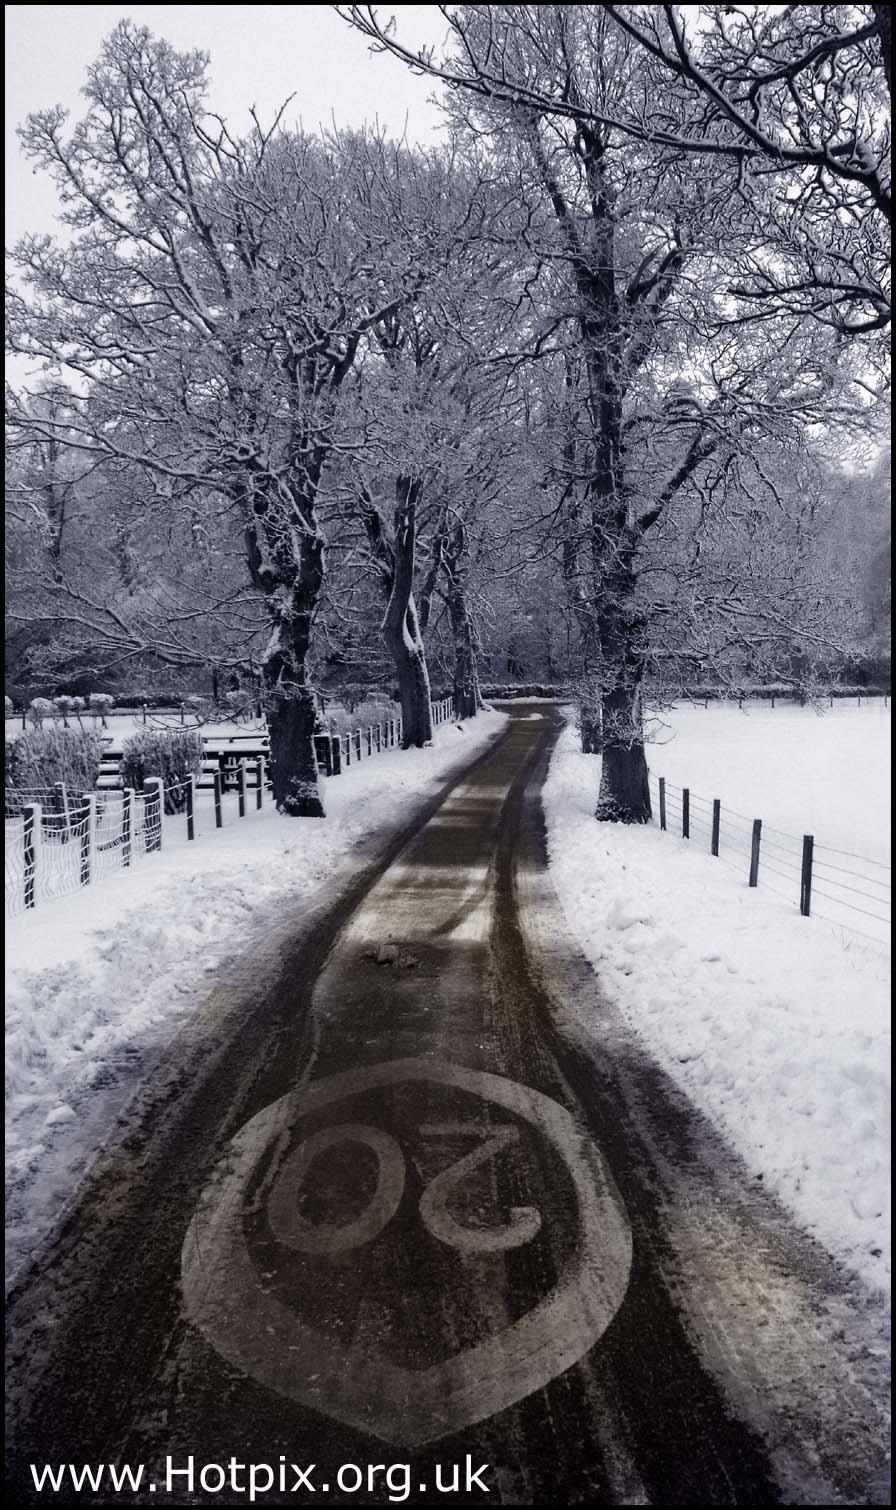 Lamington,Village,Scotland,Borders,Scottish,Lanarkshire,upper,ward,Clyde,UK,Strathclyde,snow,snowy,weather,winter,wintery,december,Xmas,Christmas,conditions,twenty,sign,20,20sign,MPH,Black,white,monochrome,sepia,selective,colour,Schotland,l'Ecosse,Ecosse,Schottland,\u03a3\u03ba\u03c9\u03c4\u03af\u03b1,la,Scozia,\u30b9\u30b3\u30c3\u30c8\u30e9\u30f3\u30c9,\uc2a4\ucf54\ud2c0\ub780\ub4dc,\u0428\u043e\u0442\u043b\u0430\u043d\u0434\u0438\u044f,Escocia,\u96ea,sneeuw,neige,Schnee,\u0441\u043d\u0435\u0436\u043e\u043a,nieve,B/W,mono,partial,mixed,color,highway,road,selectivo,couleur,s\u00e9lective,vorgew\u00e4hlte,Farbe,edinbrugh,hotpix!